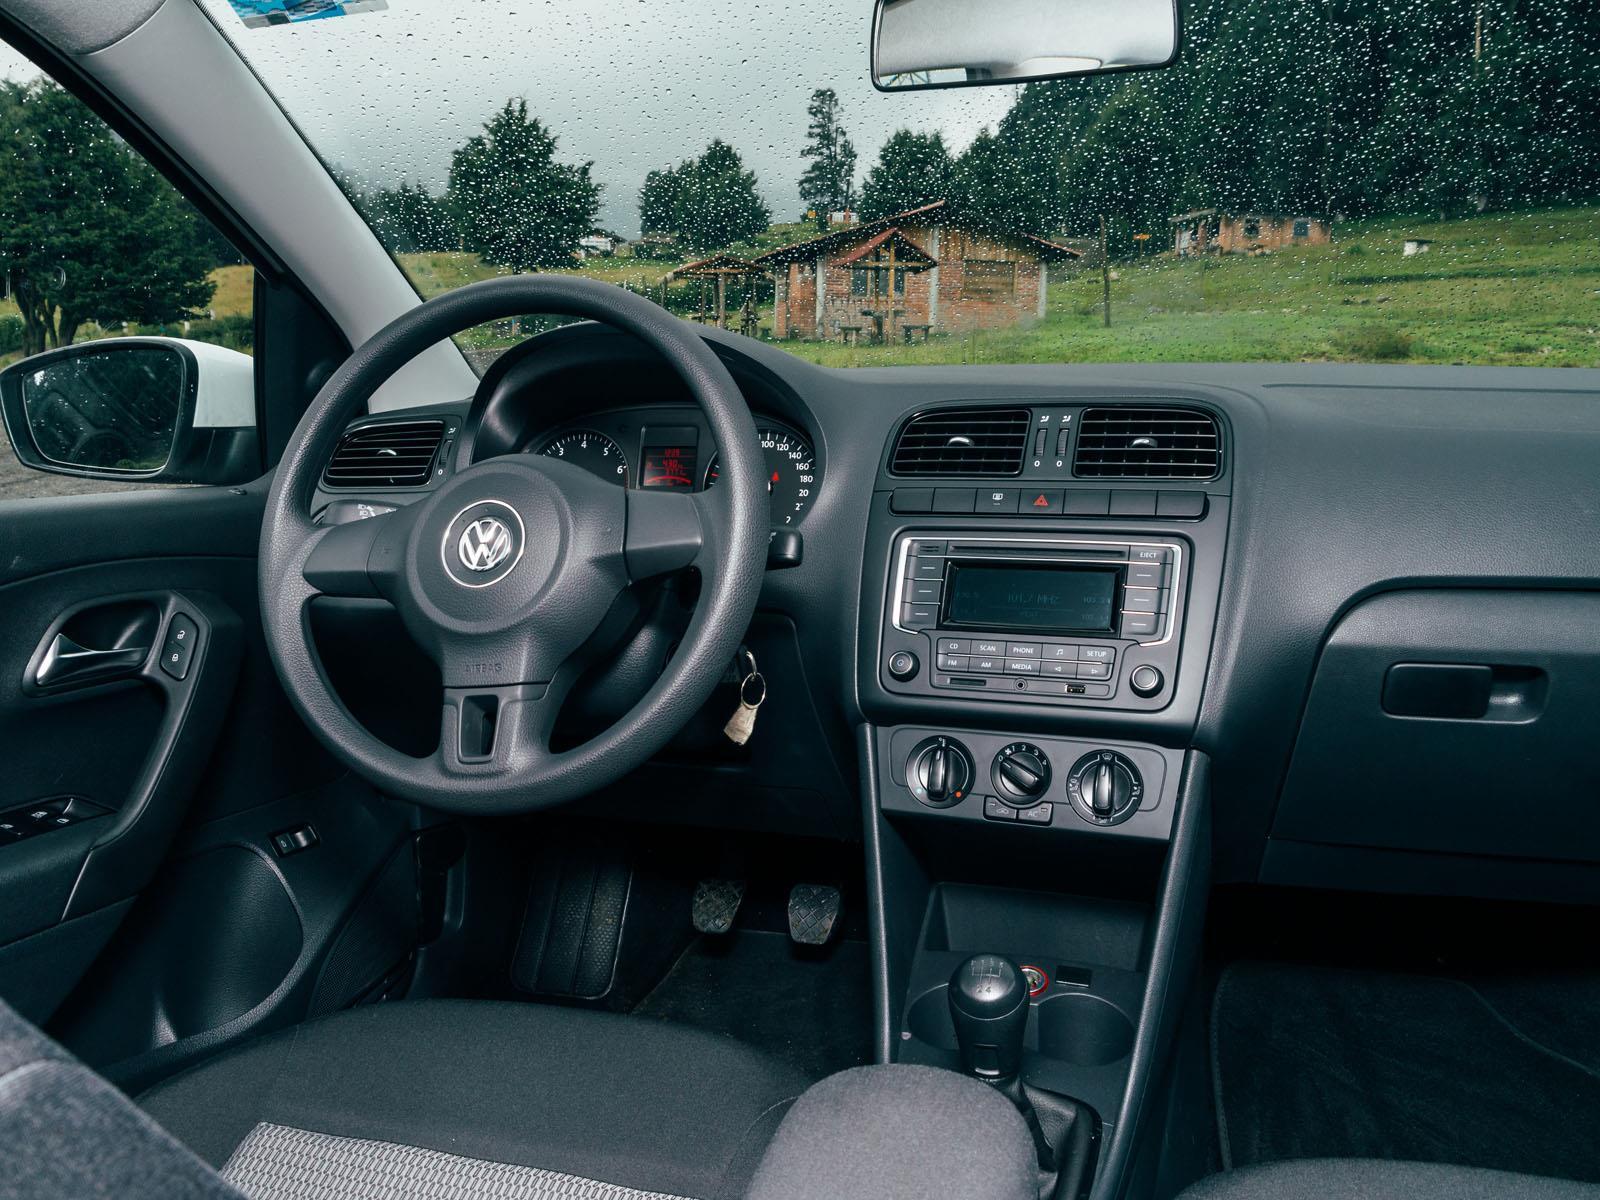 Comparativa Renault Logan Vs Volkswagen Vento Vs Nissan